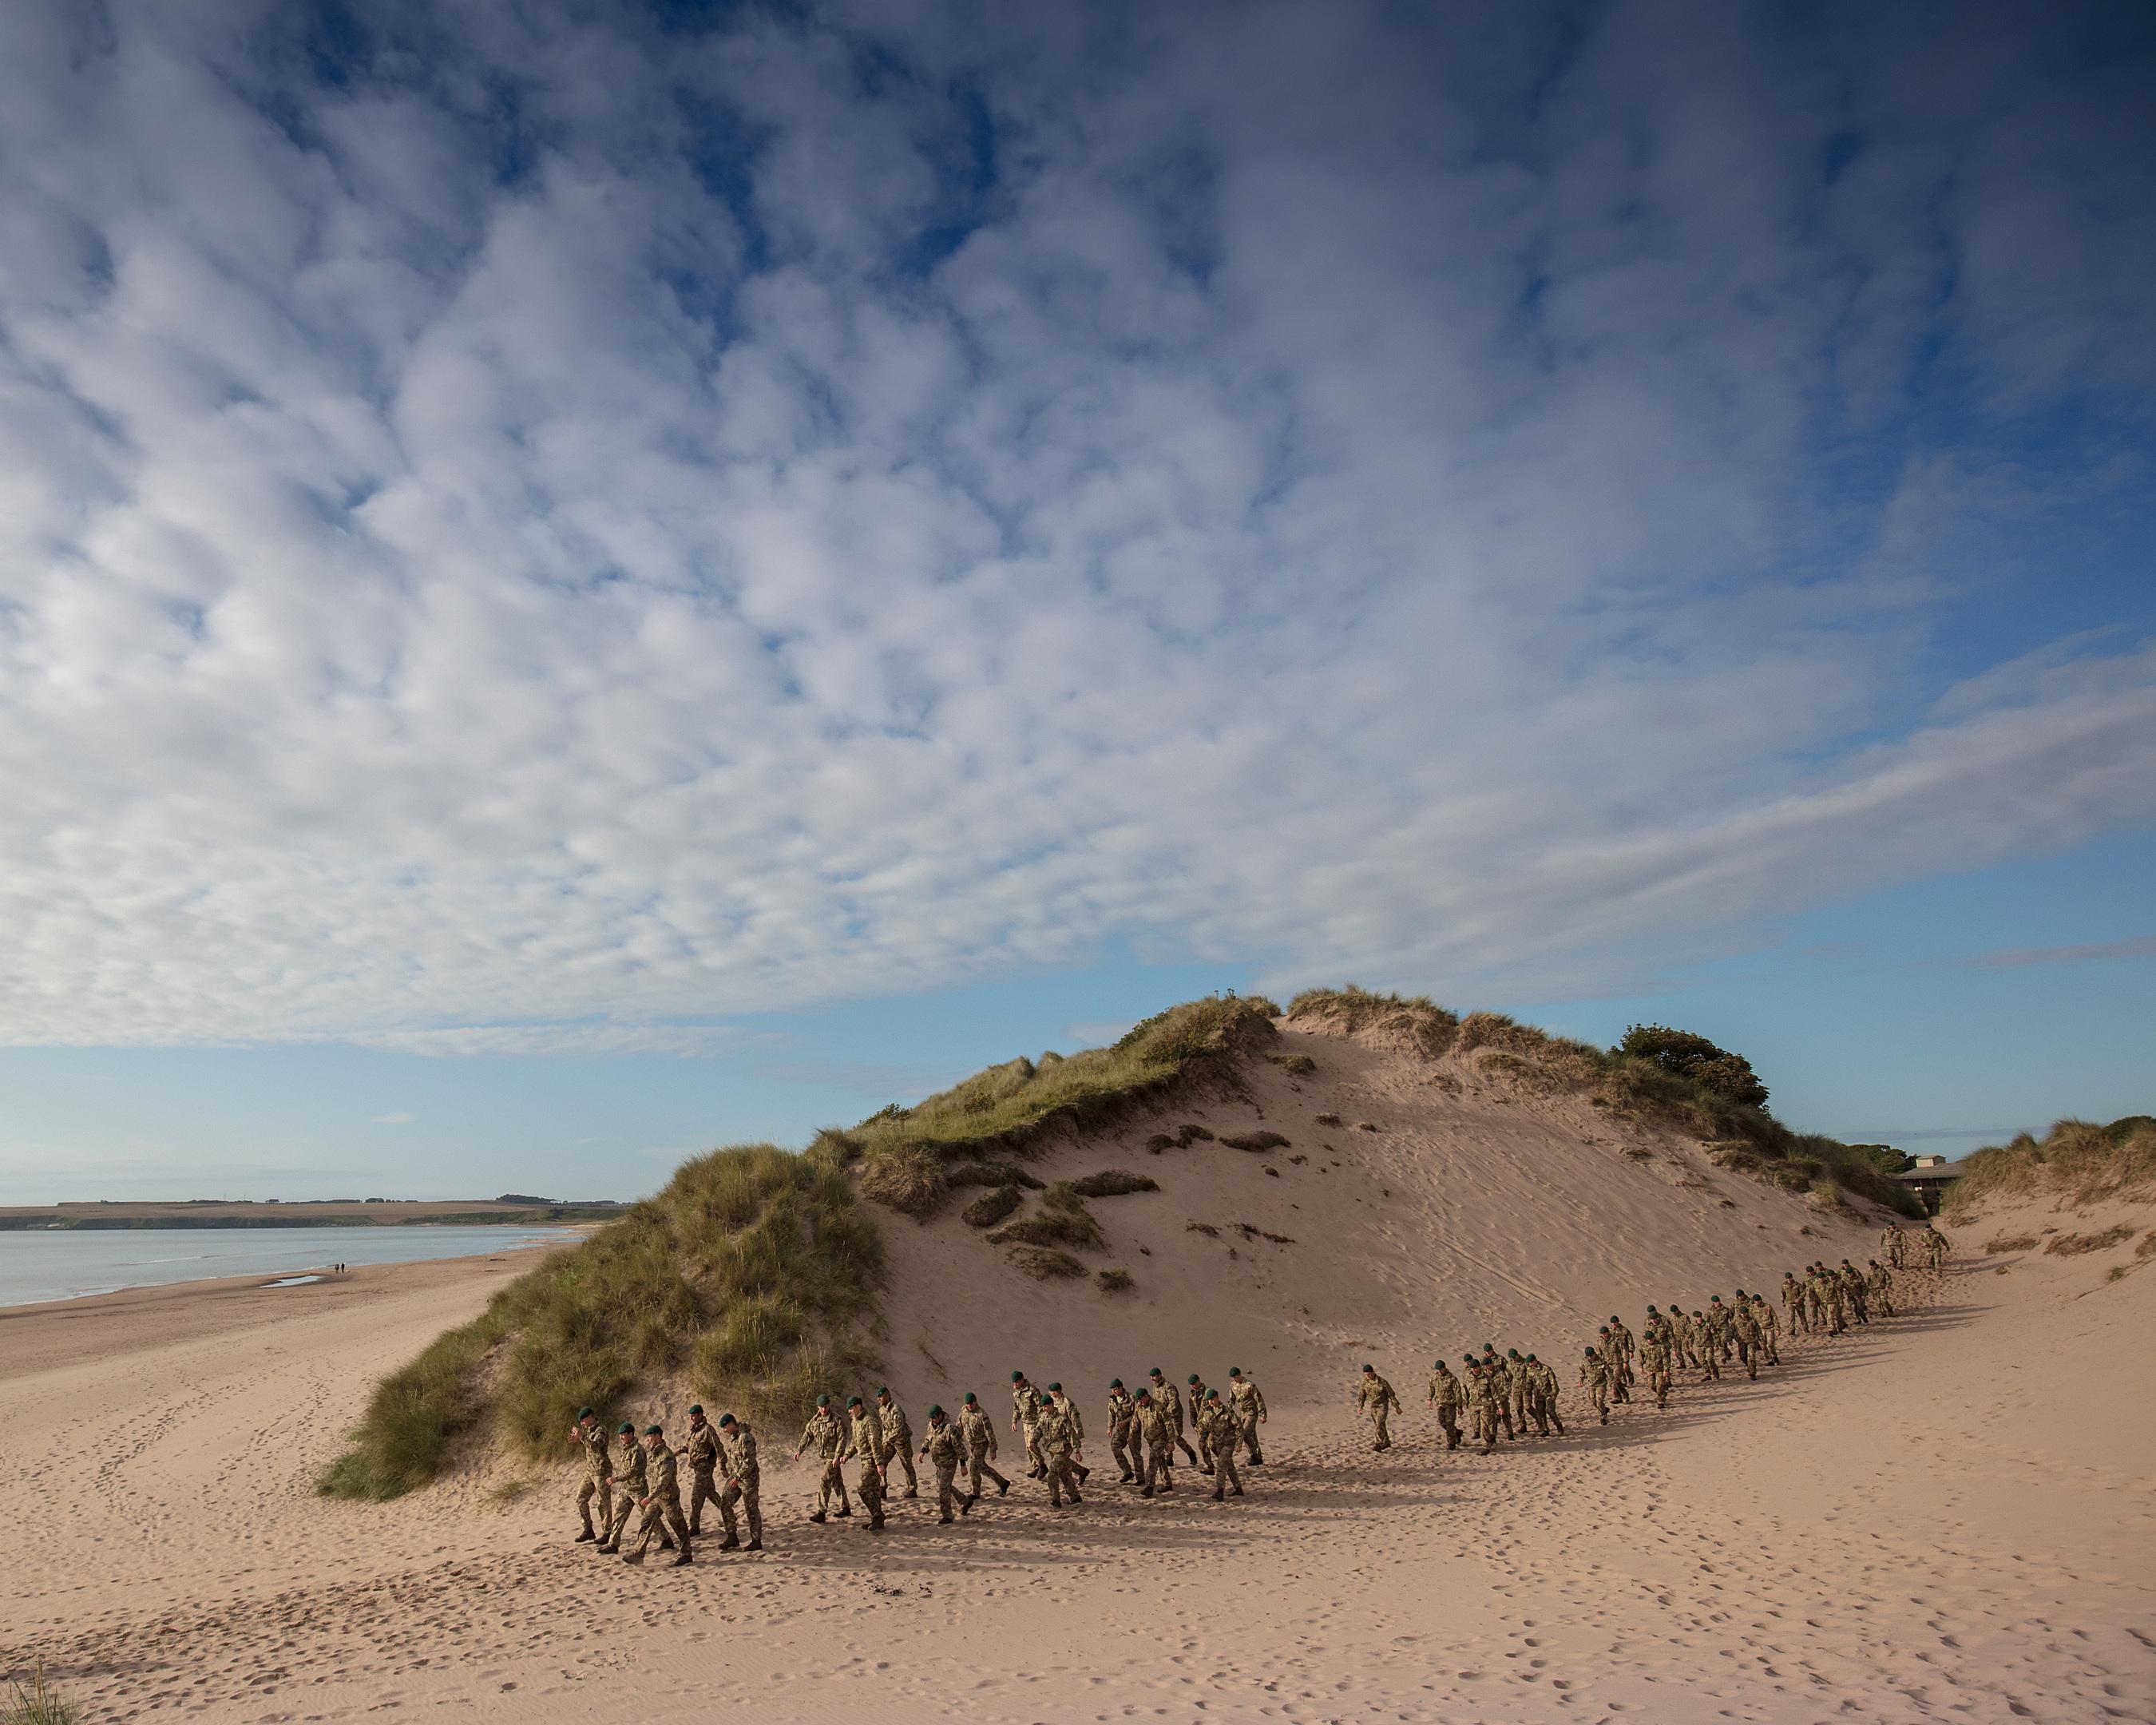 Members of 45 Commando unit ran 10 miles to Lunan Bay